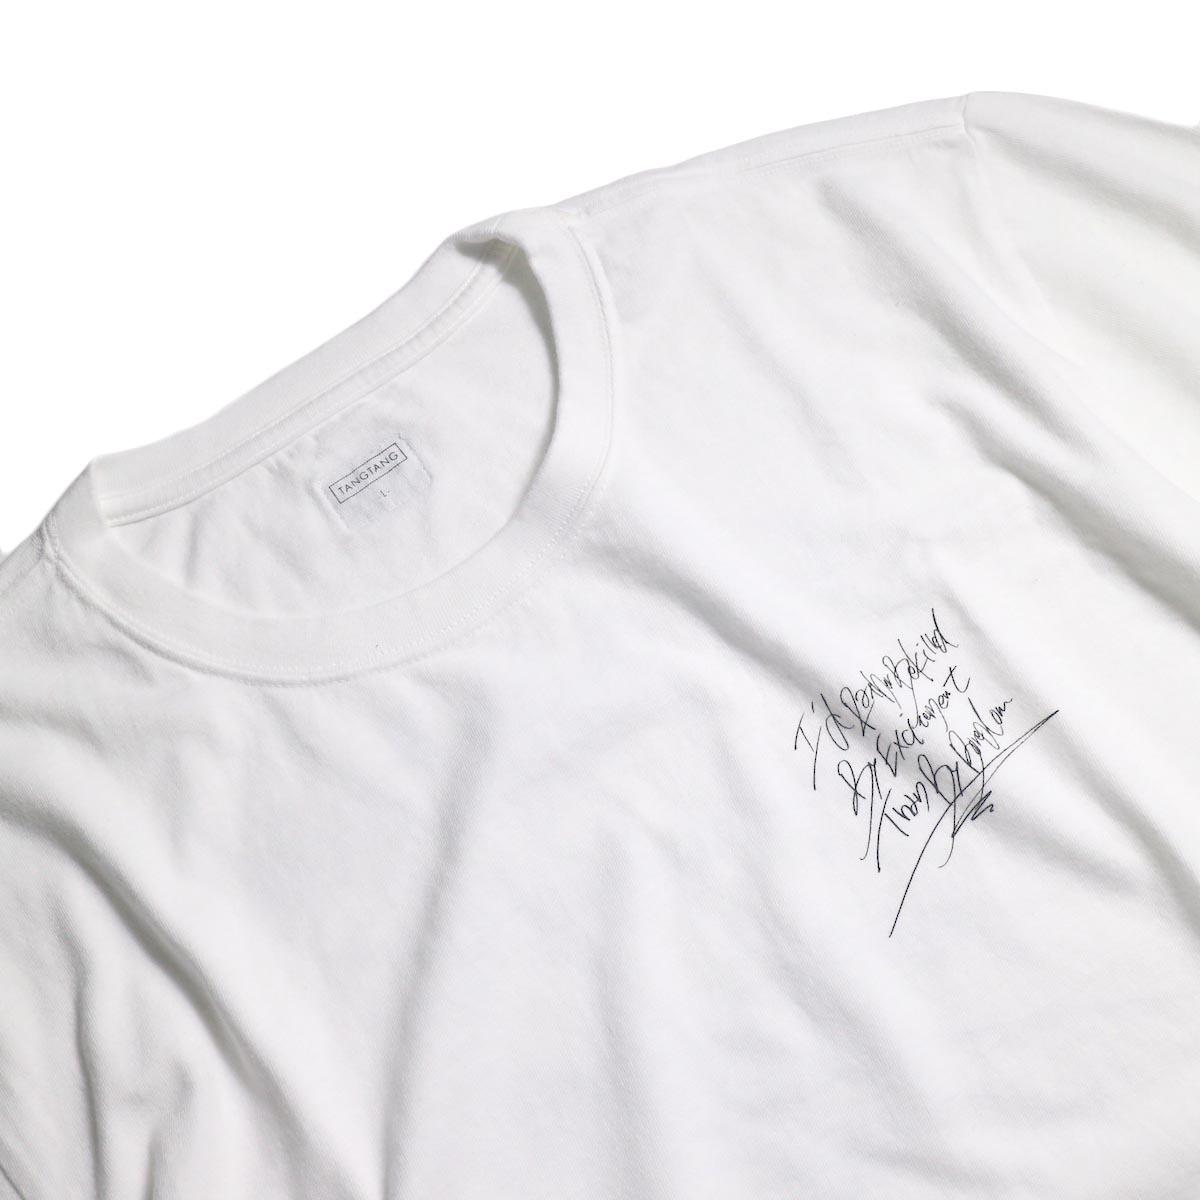 TANGTANG / SLOGAN - CHiTTiii (White)胸ロゴ